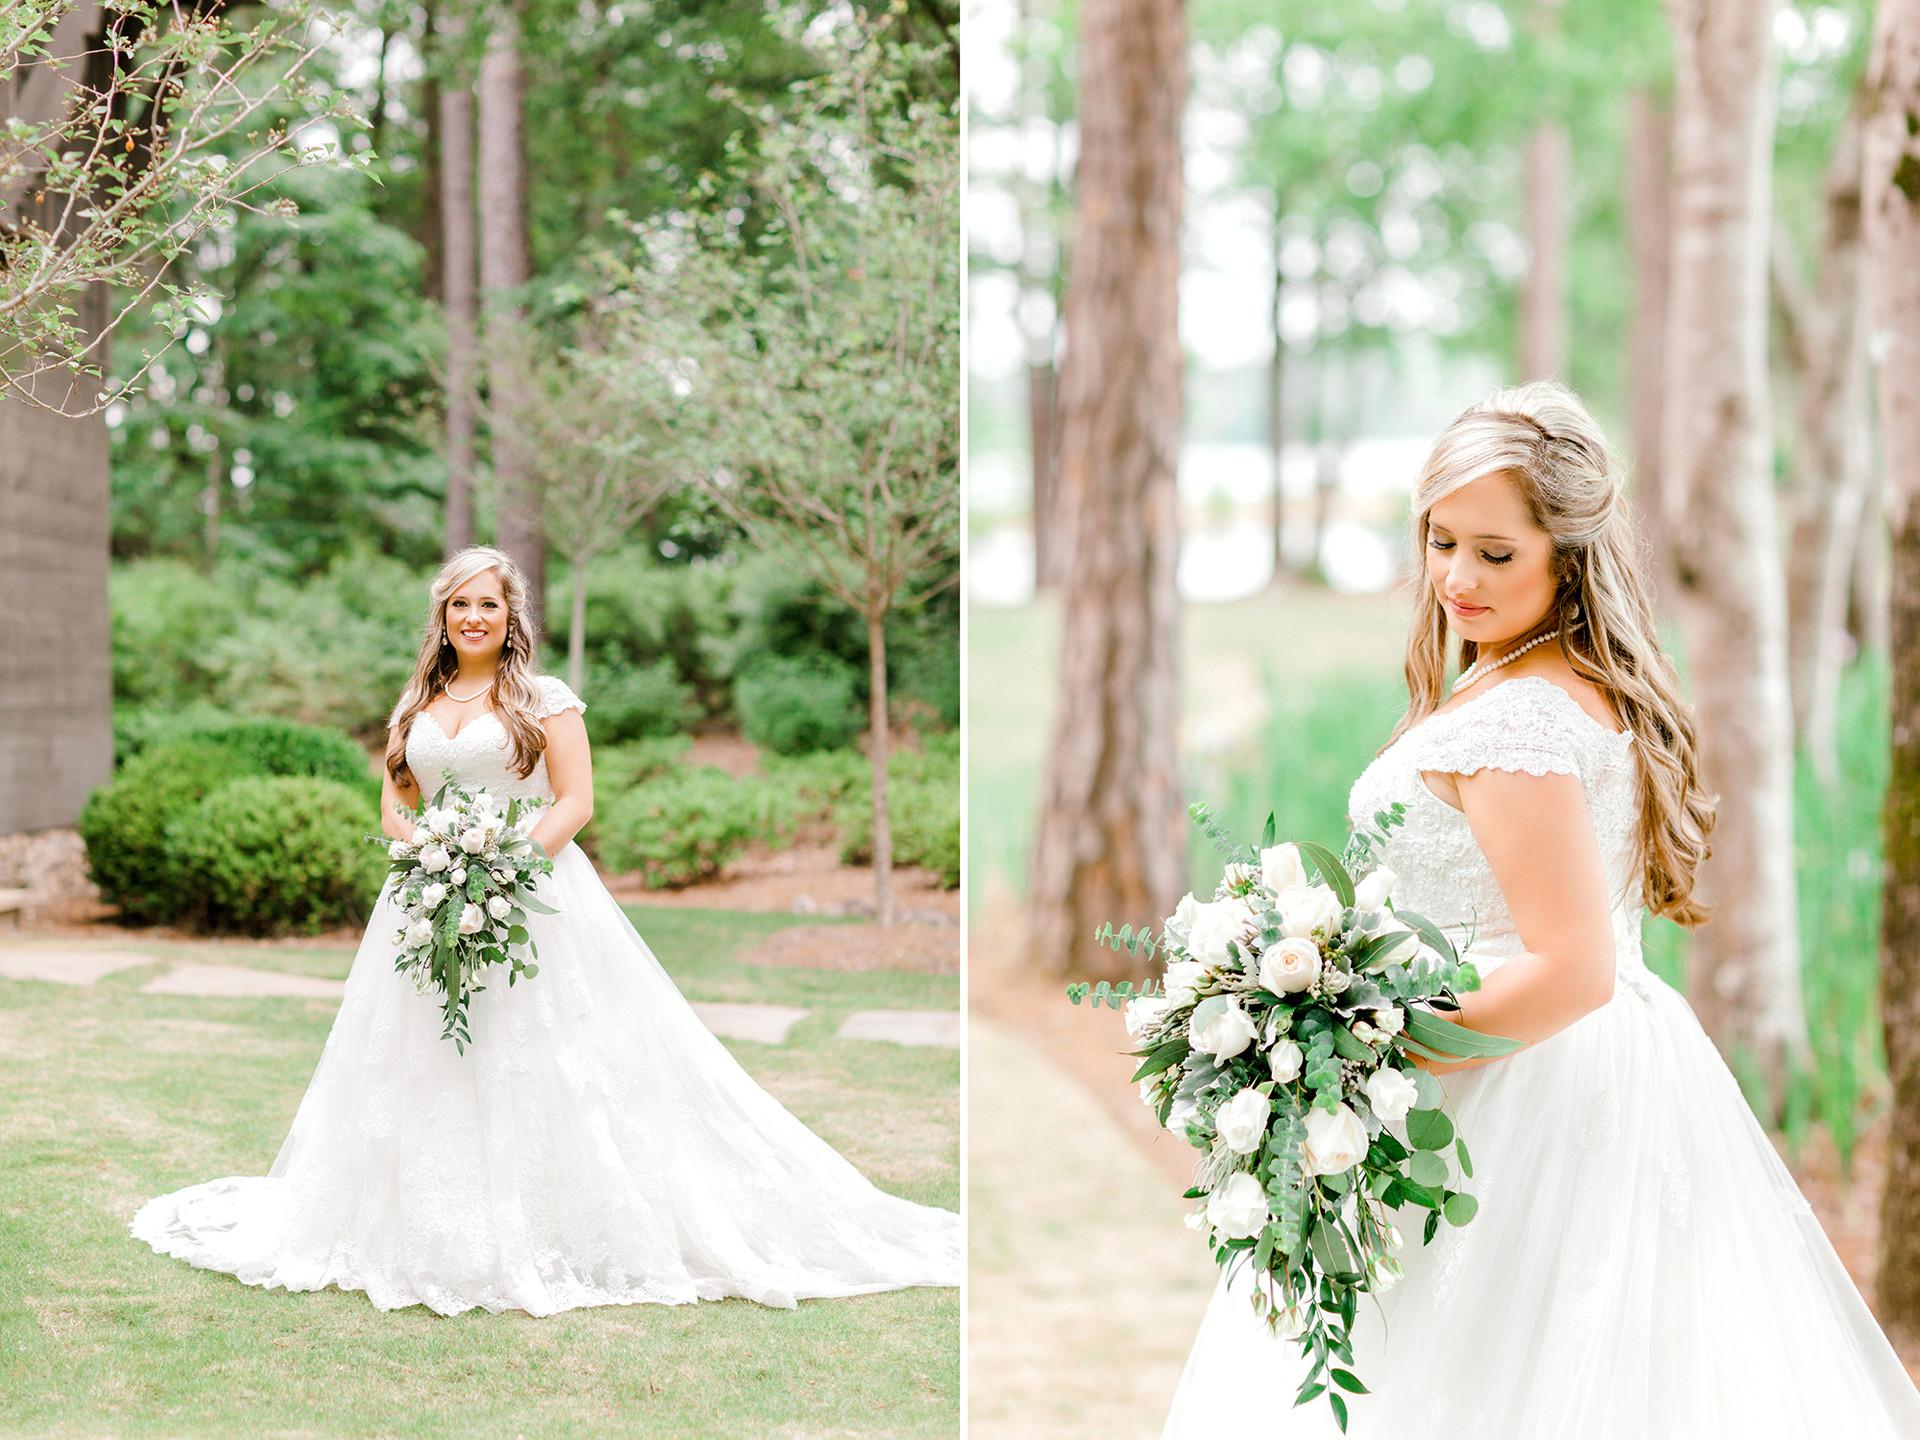 Alex + Marianne at Lake Martin, Alabama